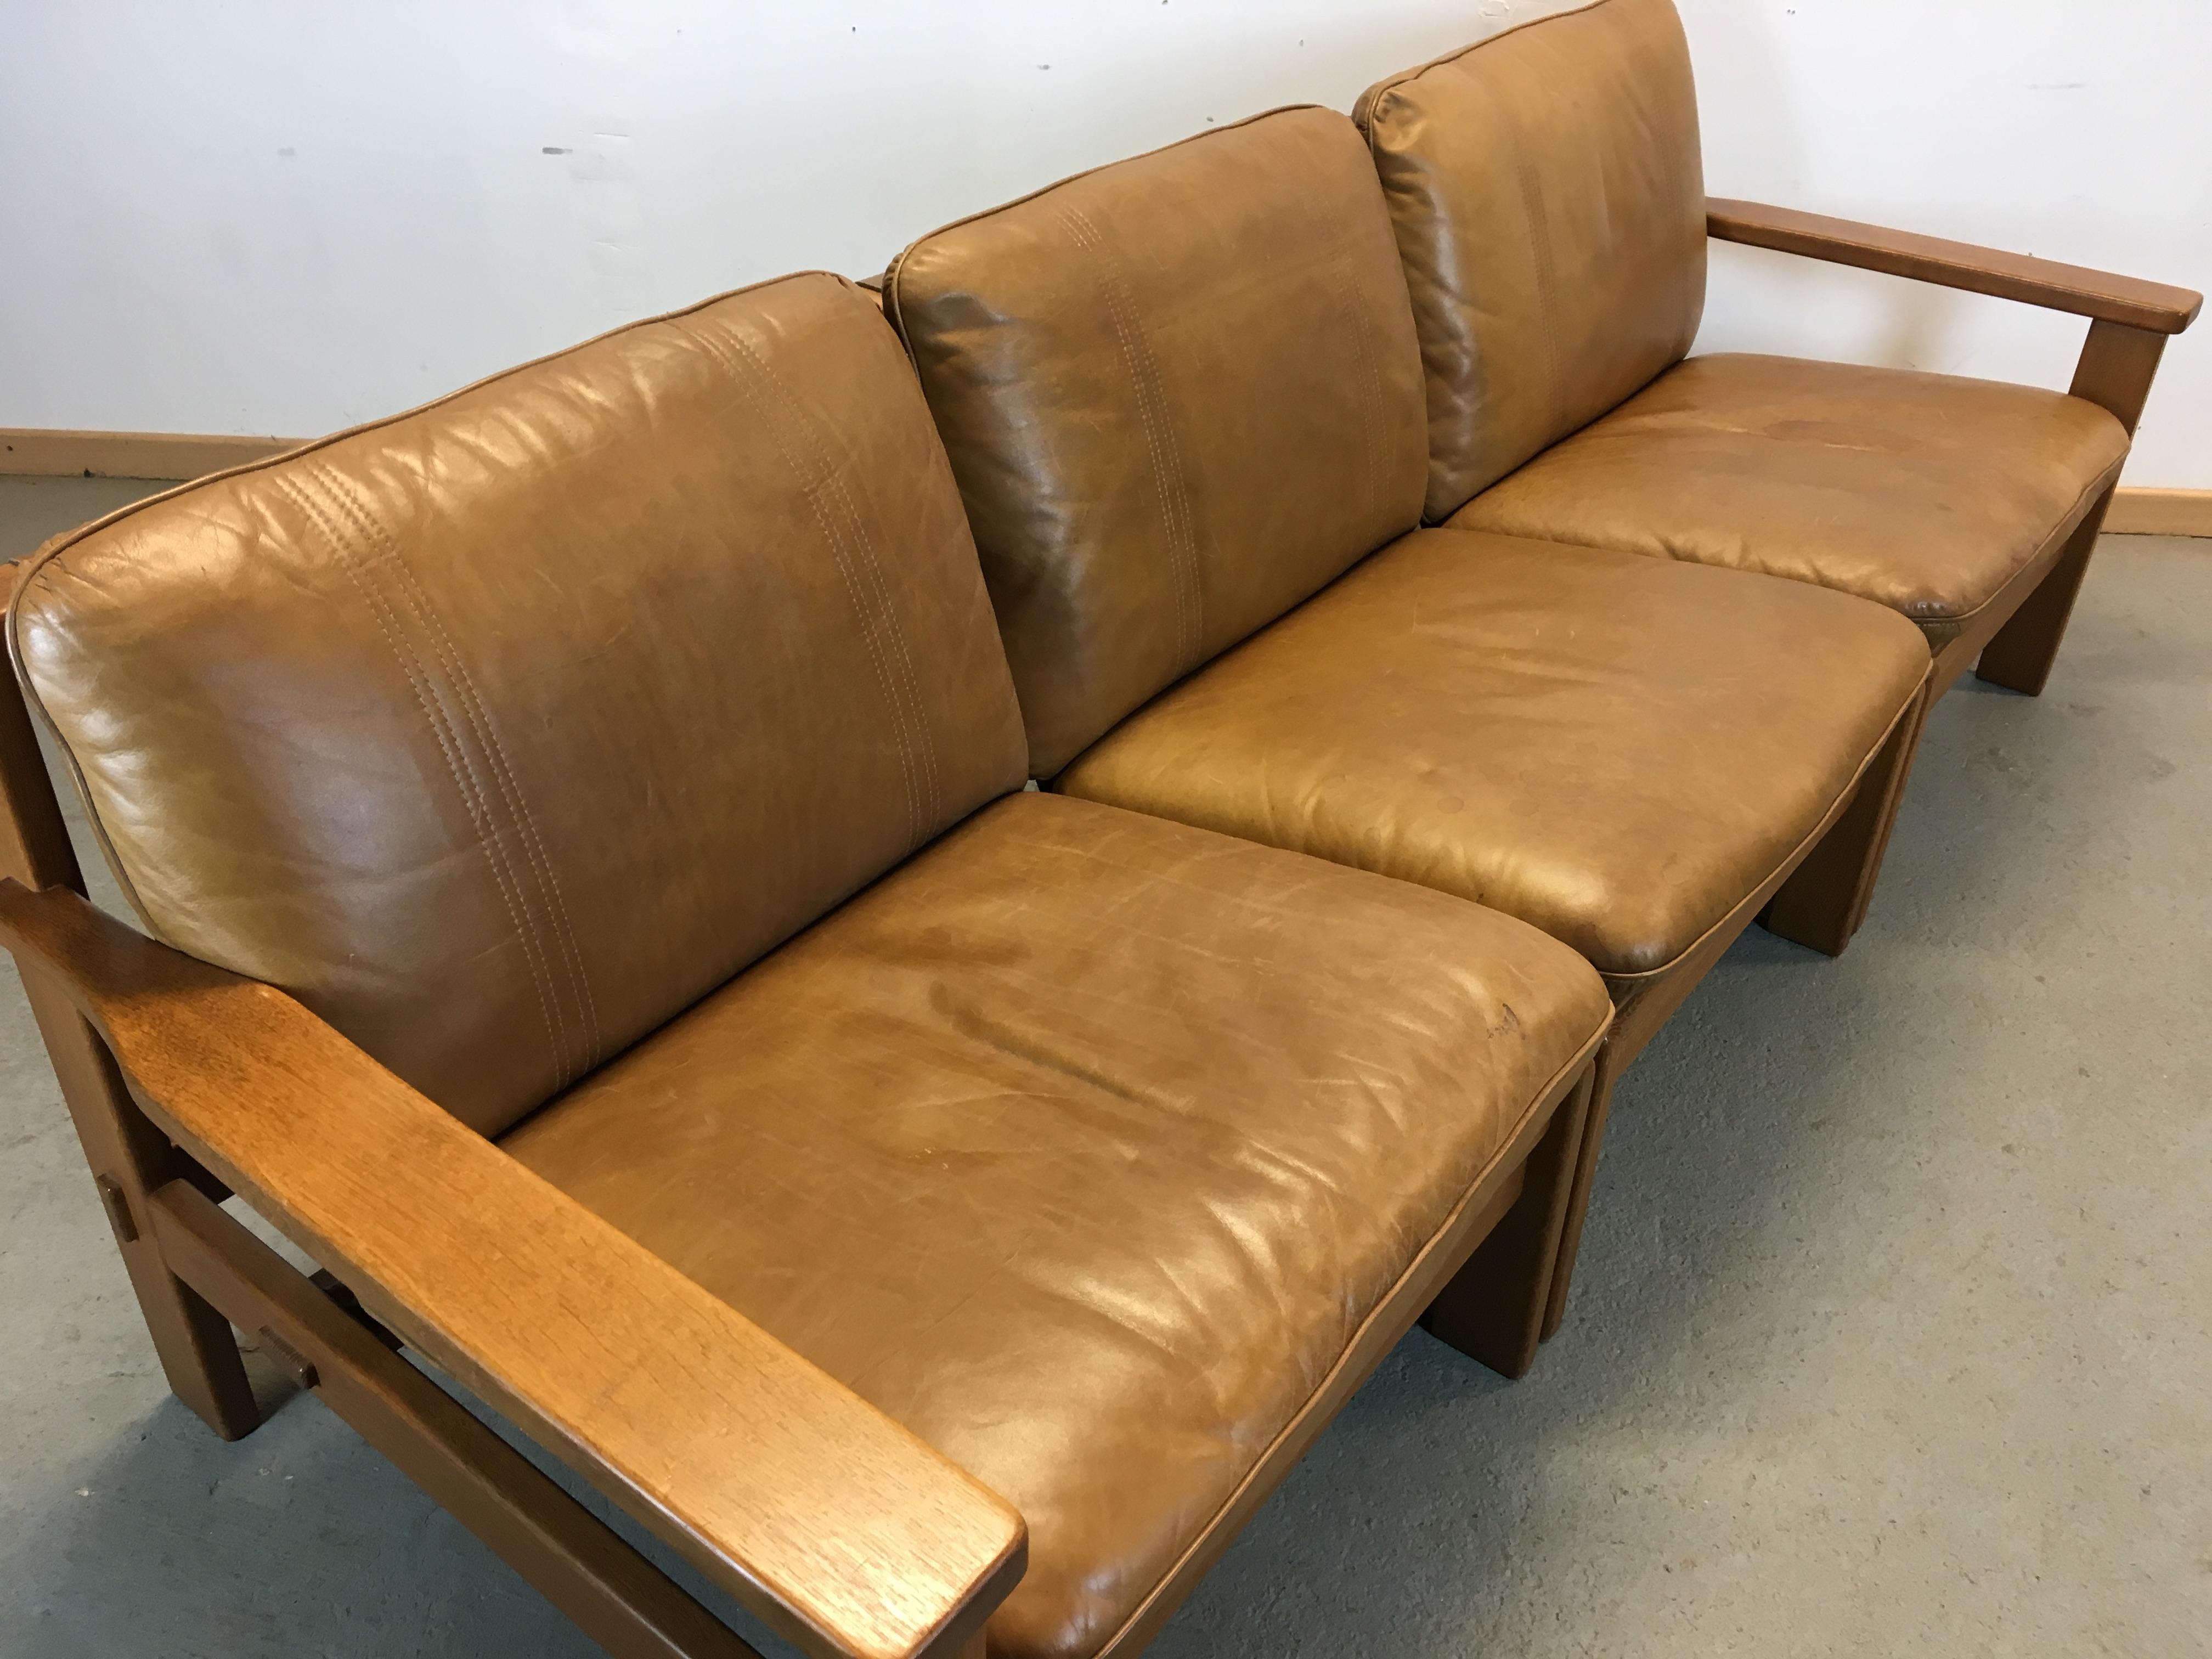 canap cuir modulable ann e 60 vintage sofa modular. Black Bedroom Furniture Sets. Home Design Ideas